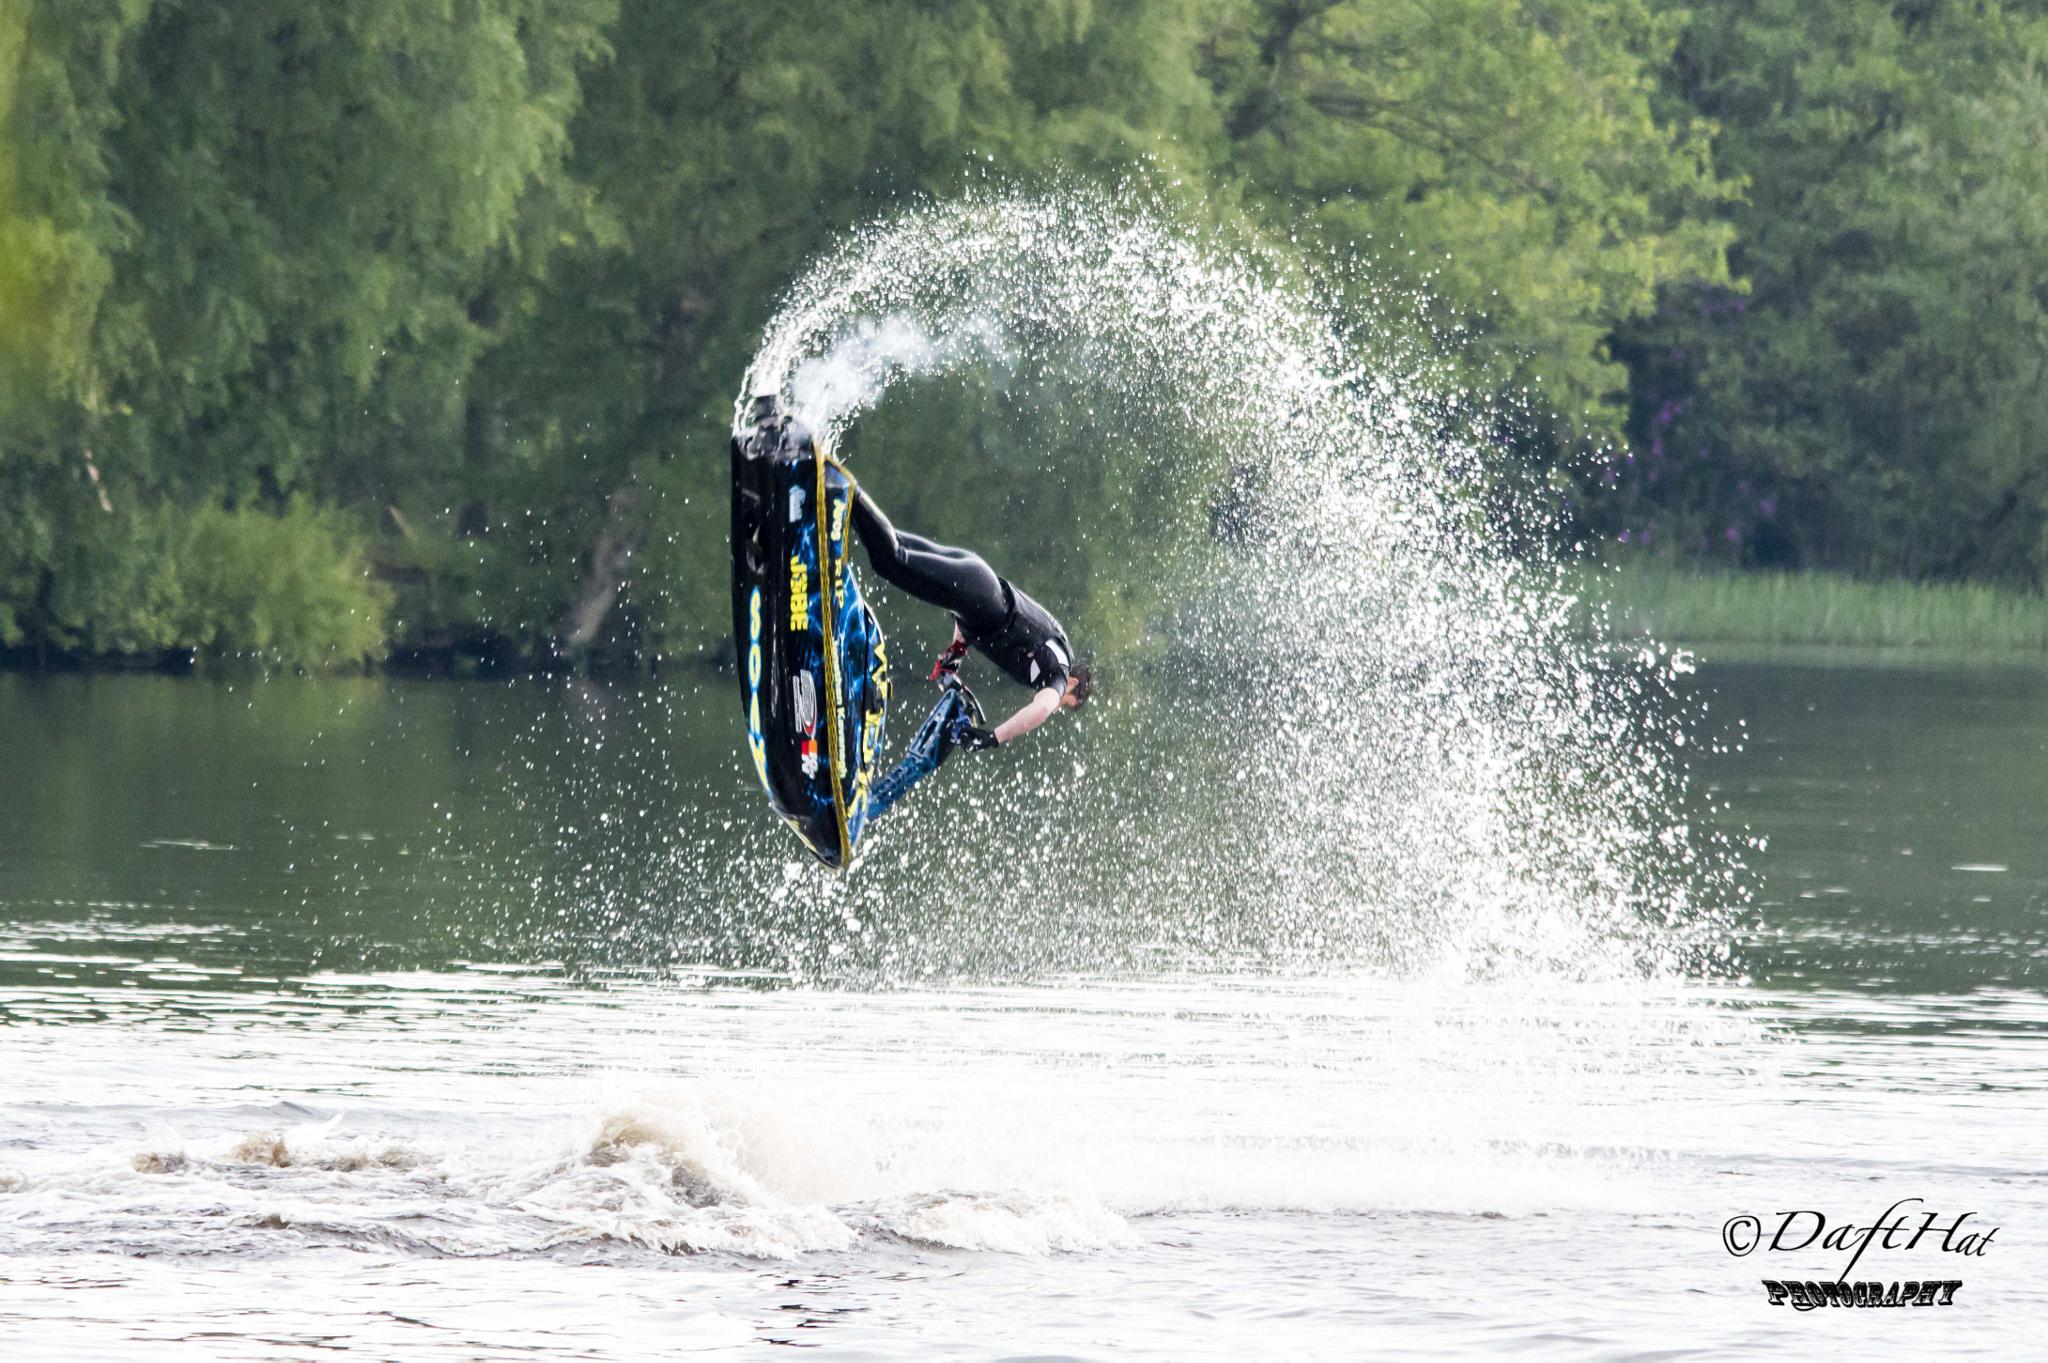 jet ski tricks by Vincent Yates